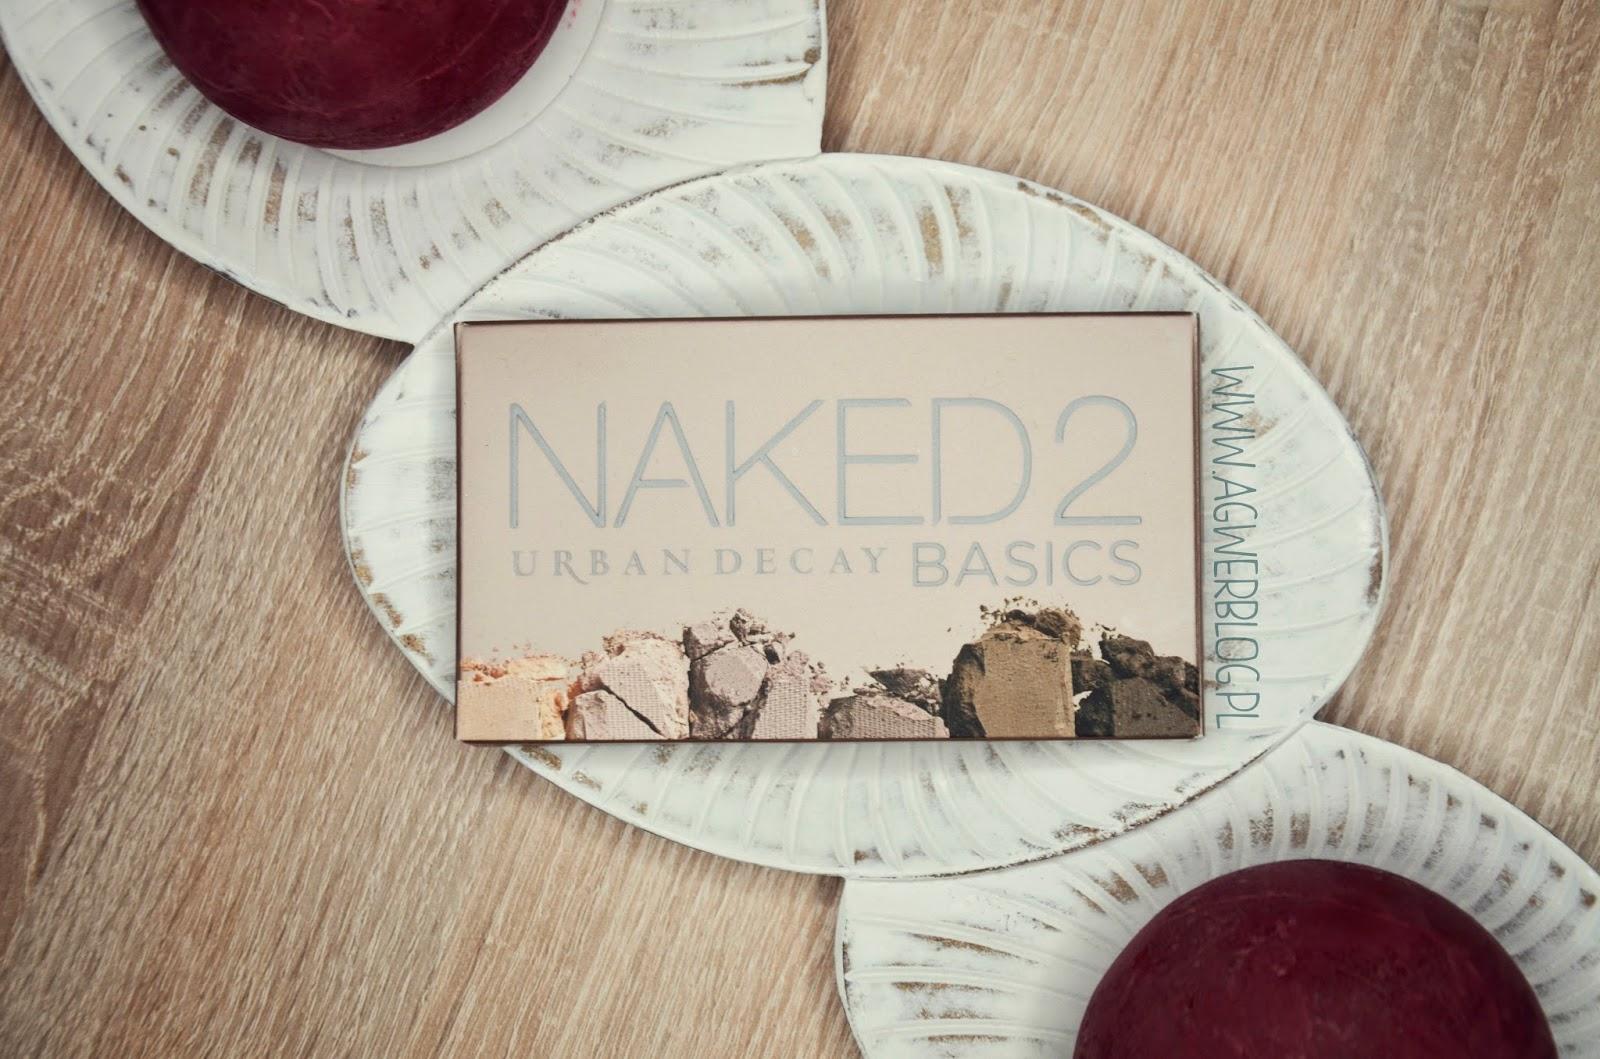 Urban-Decay-Naked-Basics-2